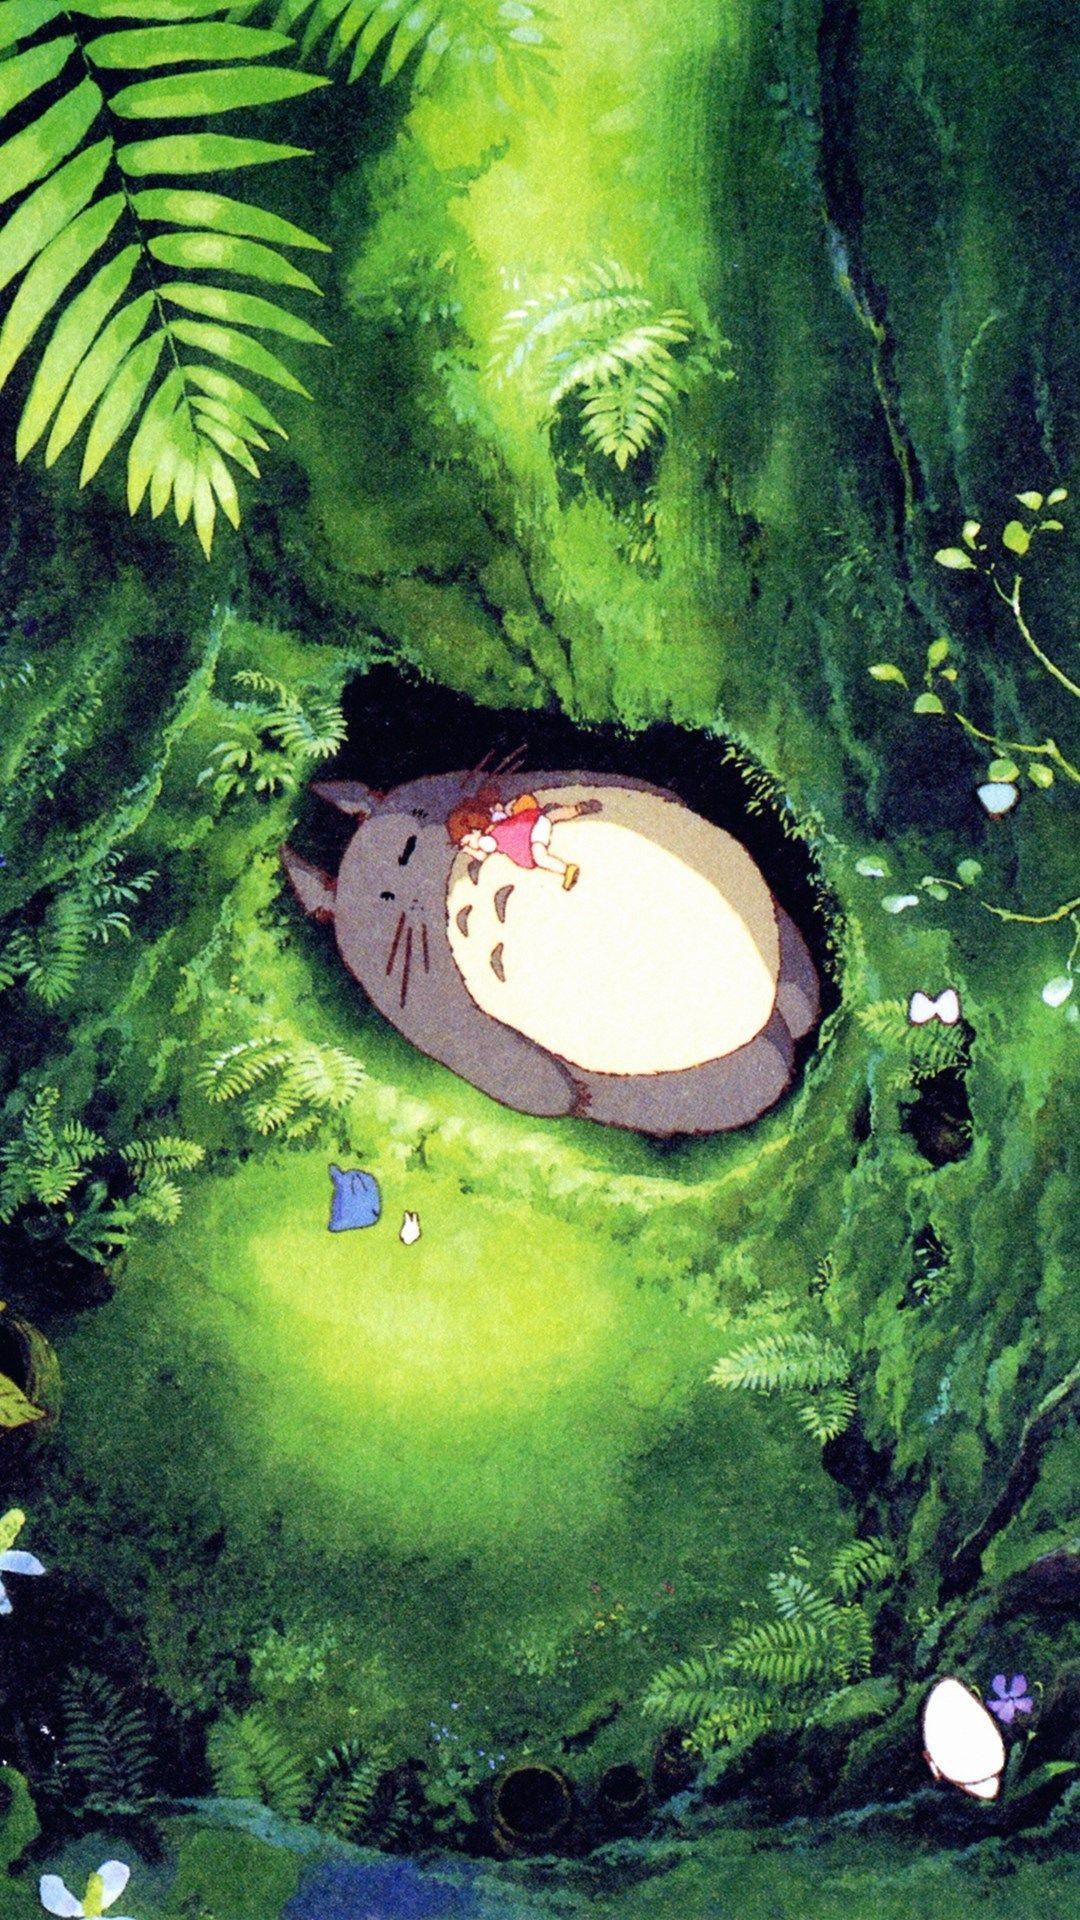 japan totoro art green anime illustration iphone photos ...